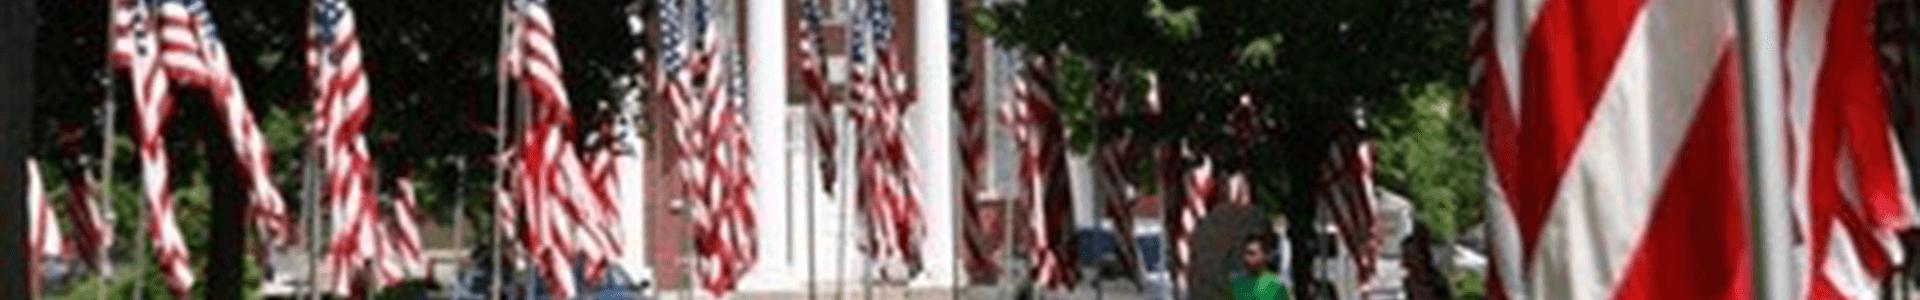 aisle of flags